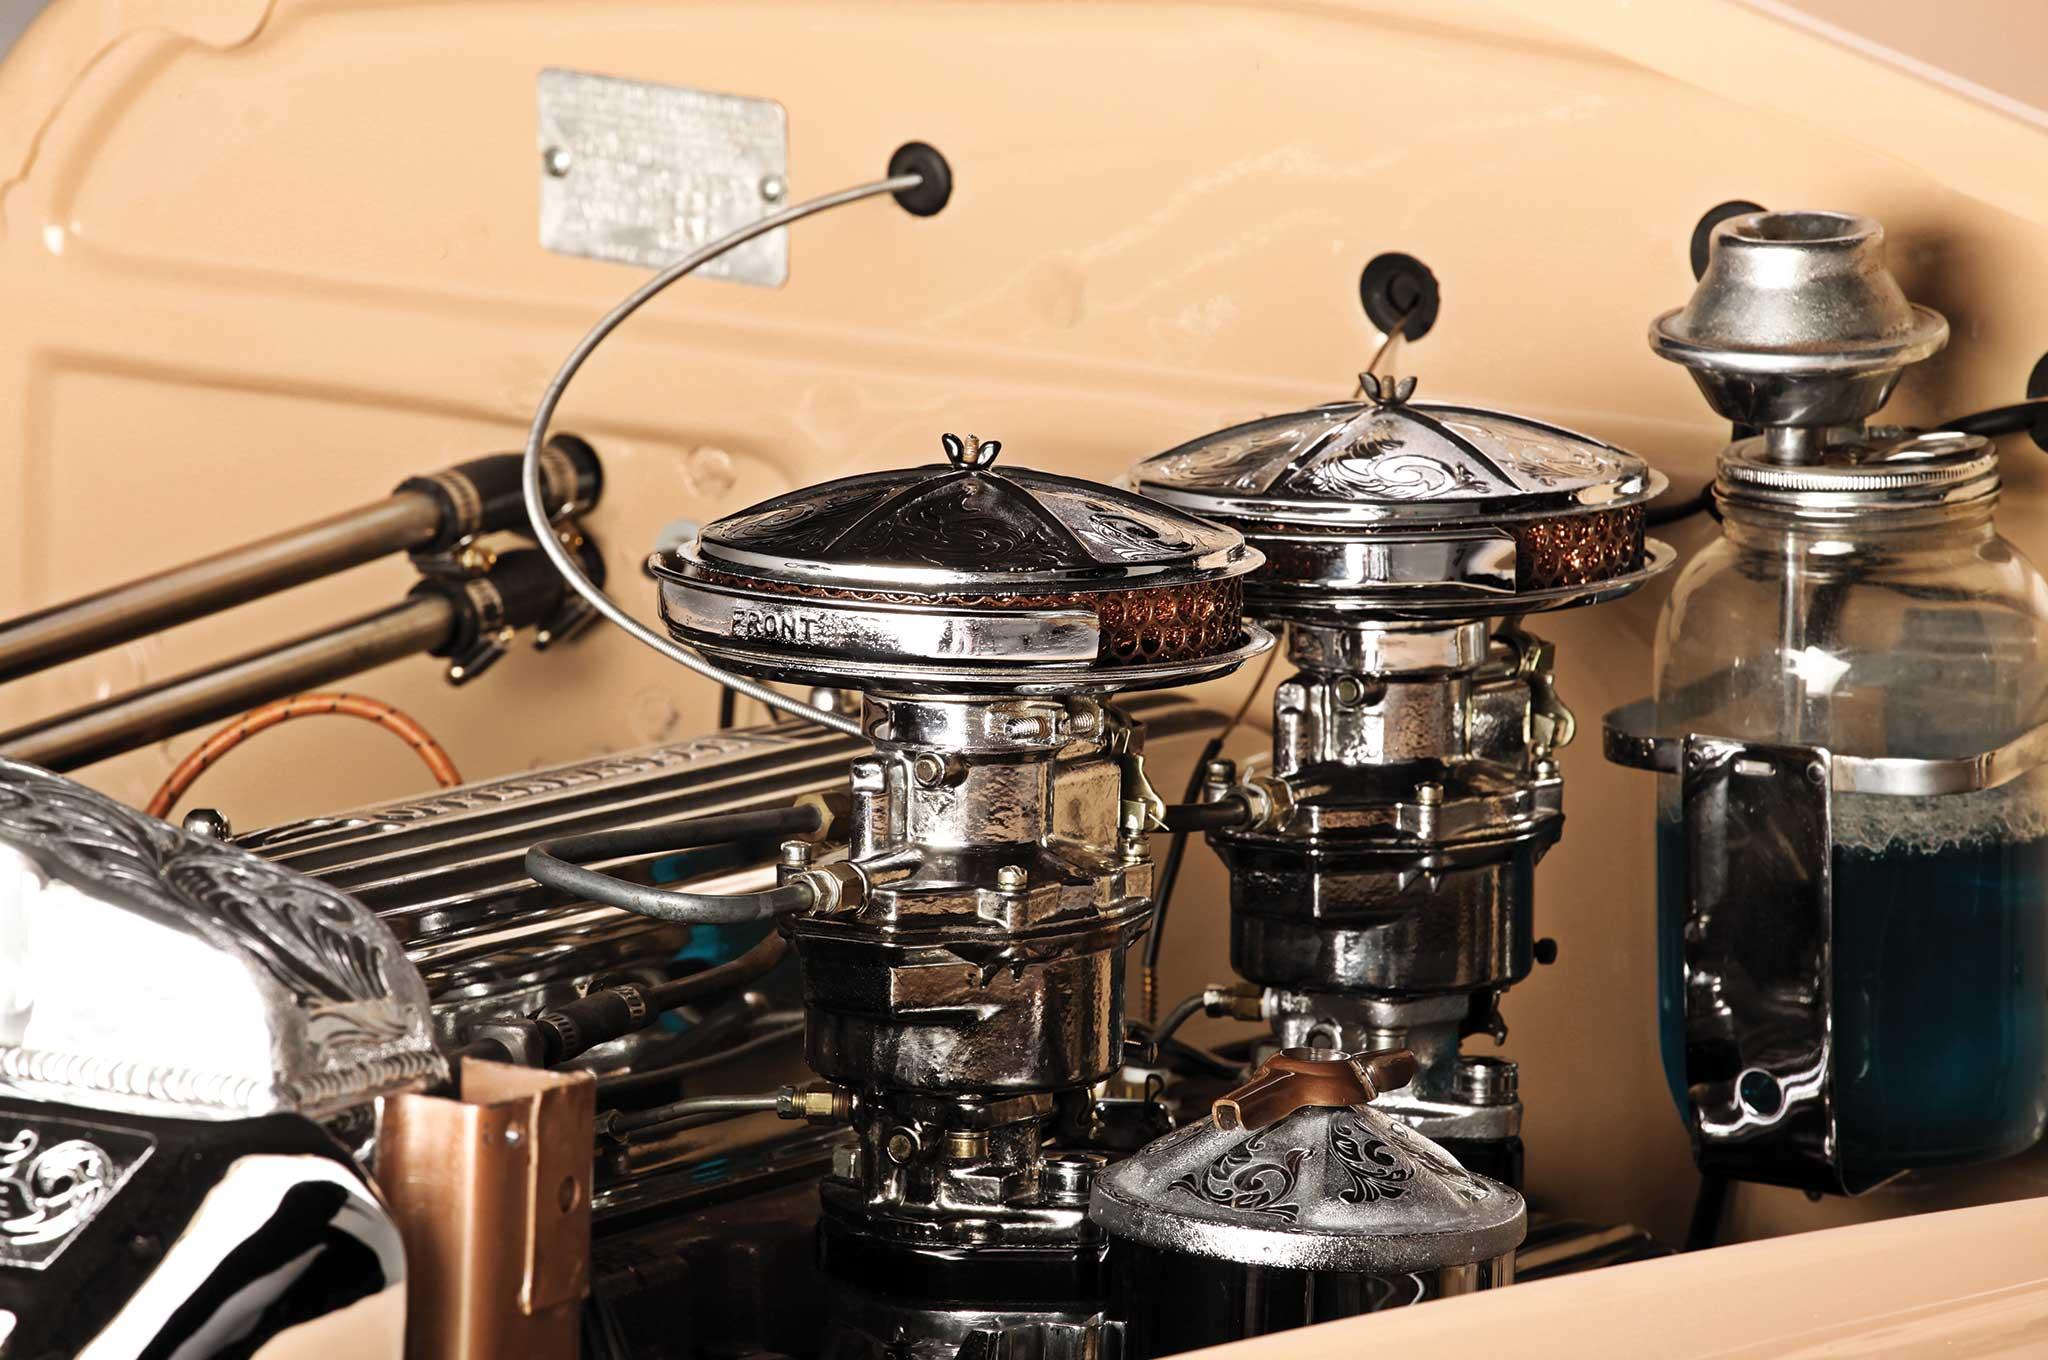 1947 chevy fleetline dual rochester single barrel carburetors 011